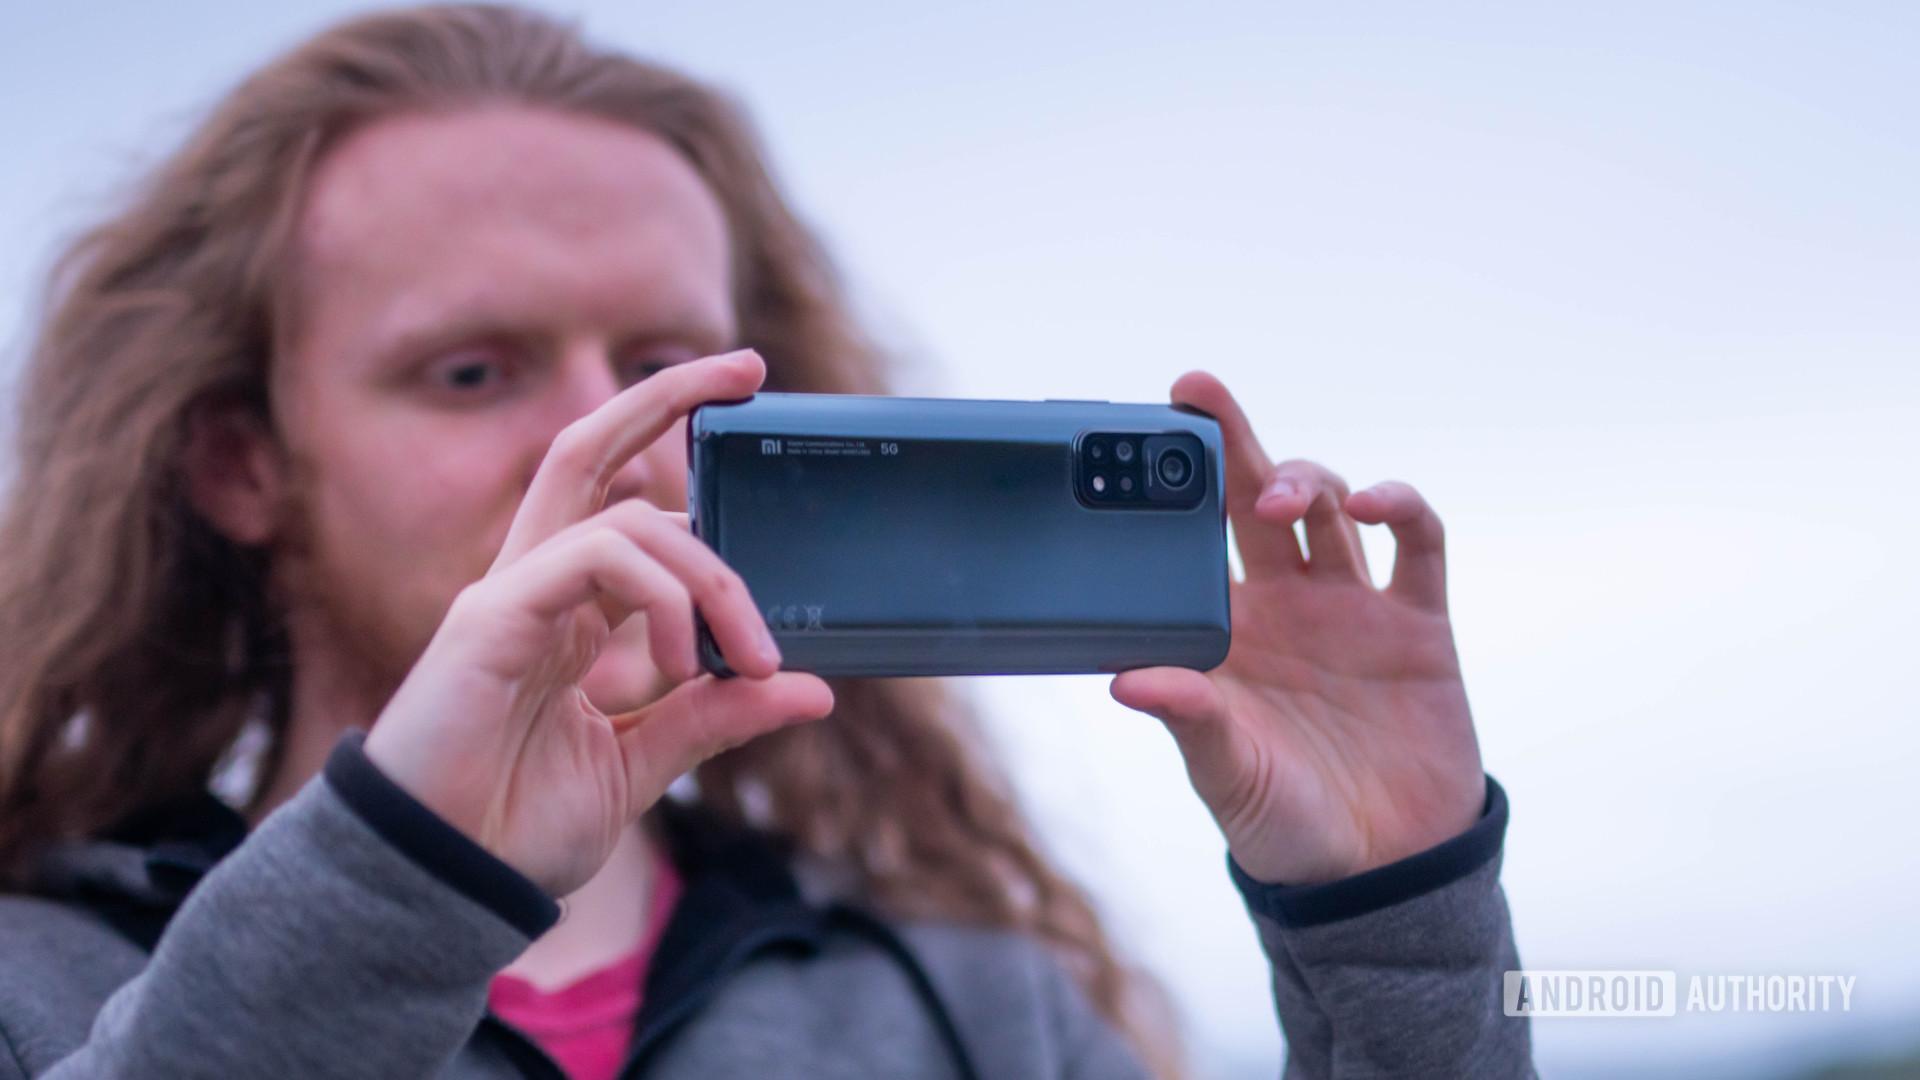 Xiaomi Mi 10T Pro holding the phone to take a photo